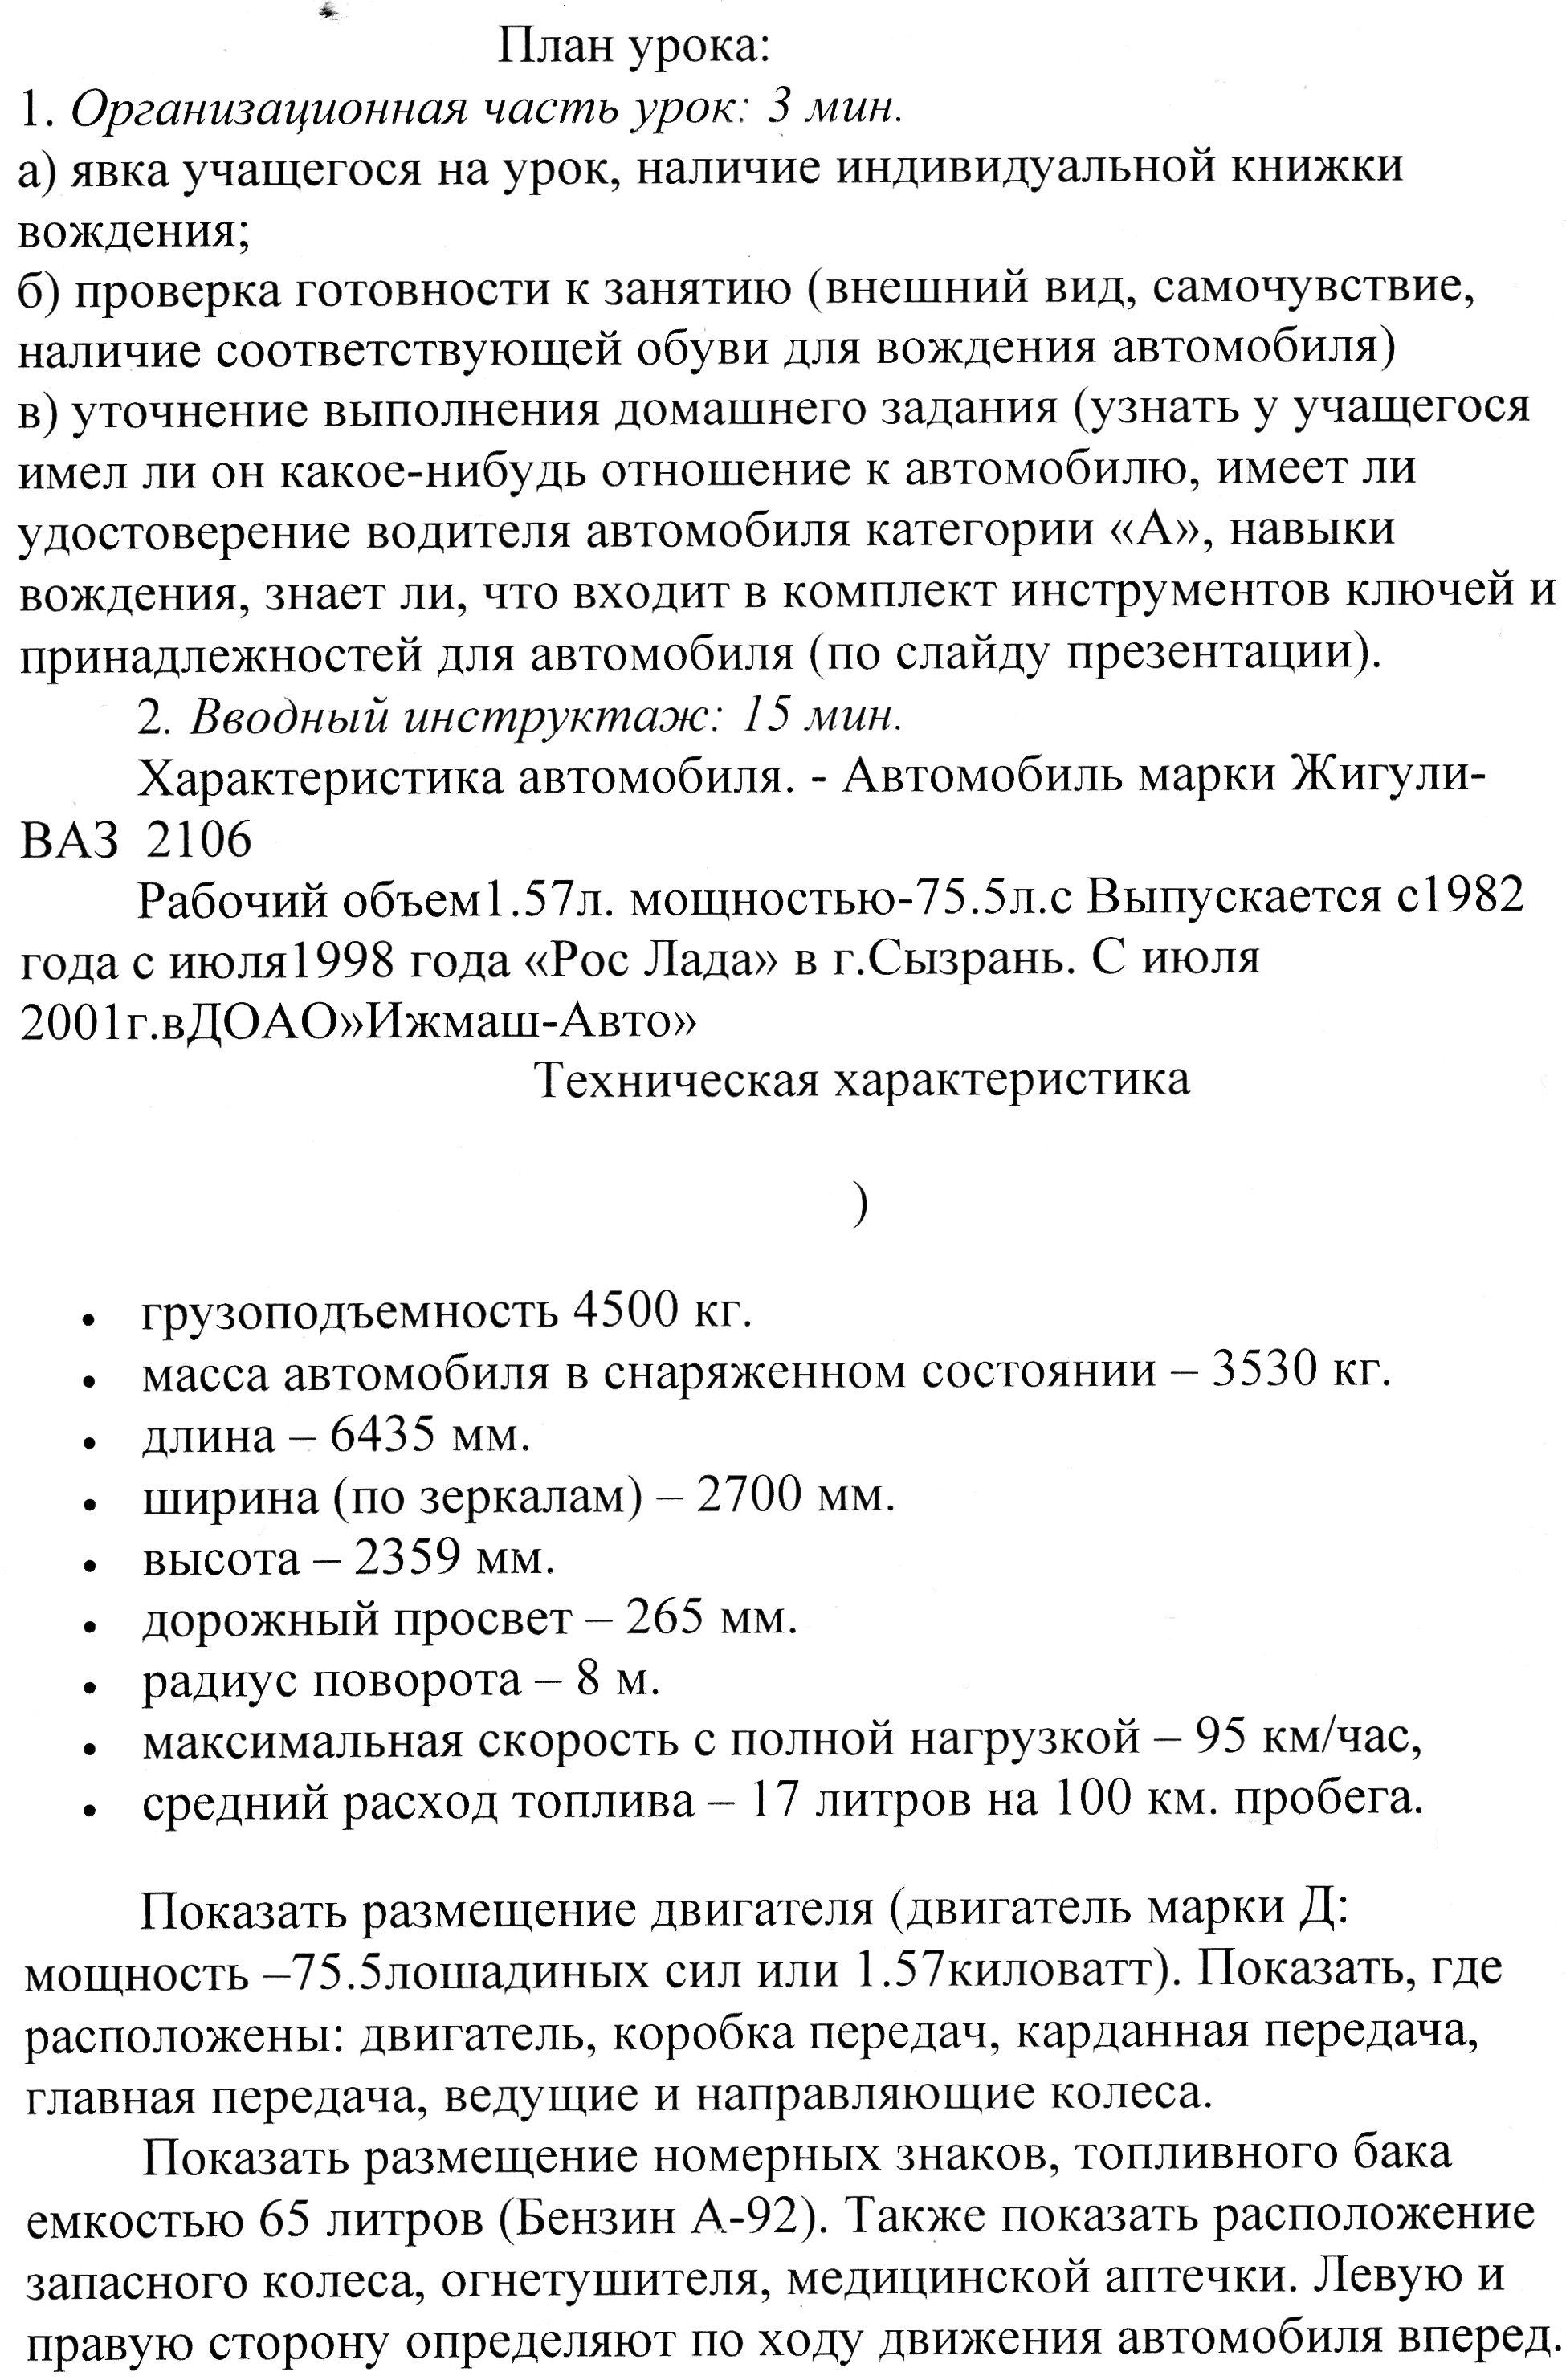 C:\Users\Василий Мельченко\Pictures\img621.jpg